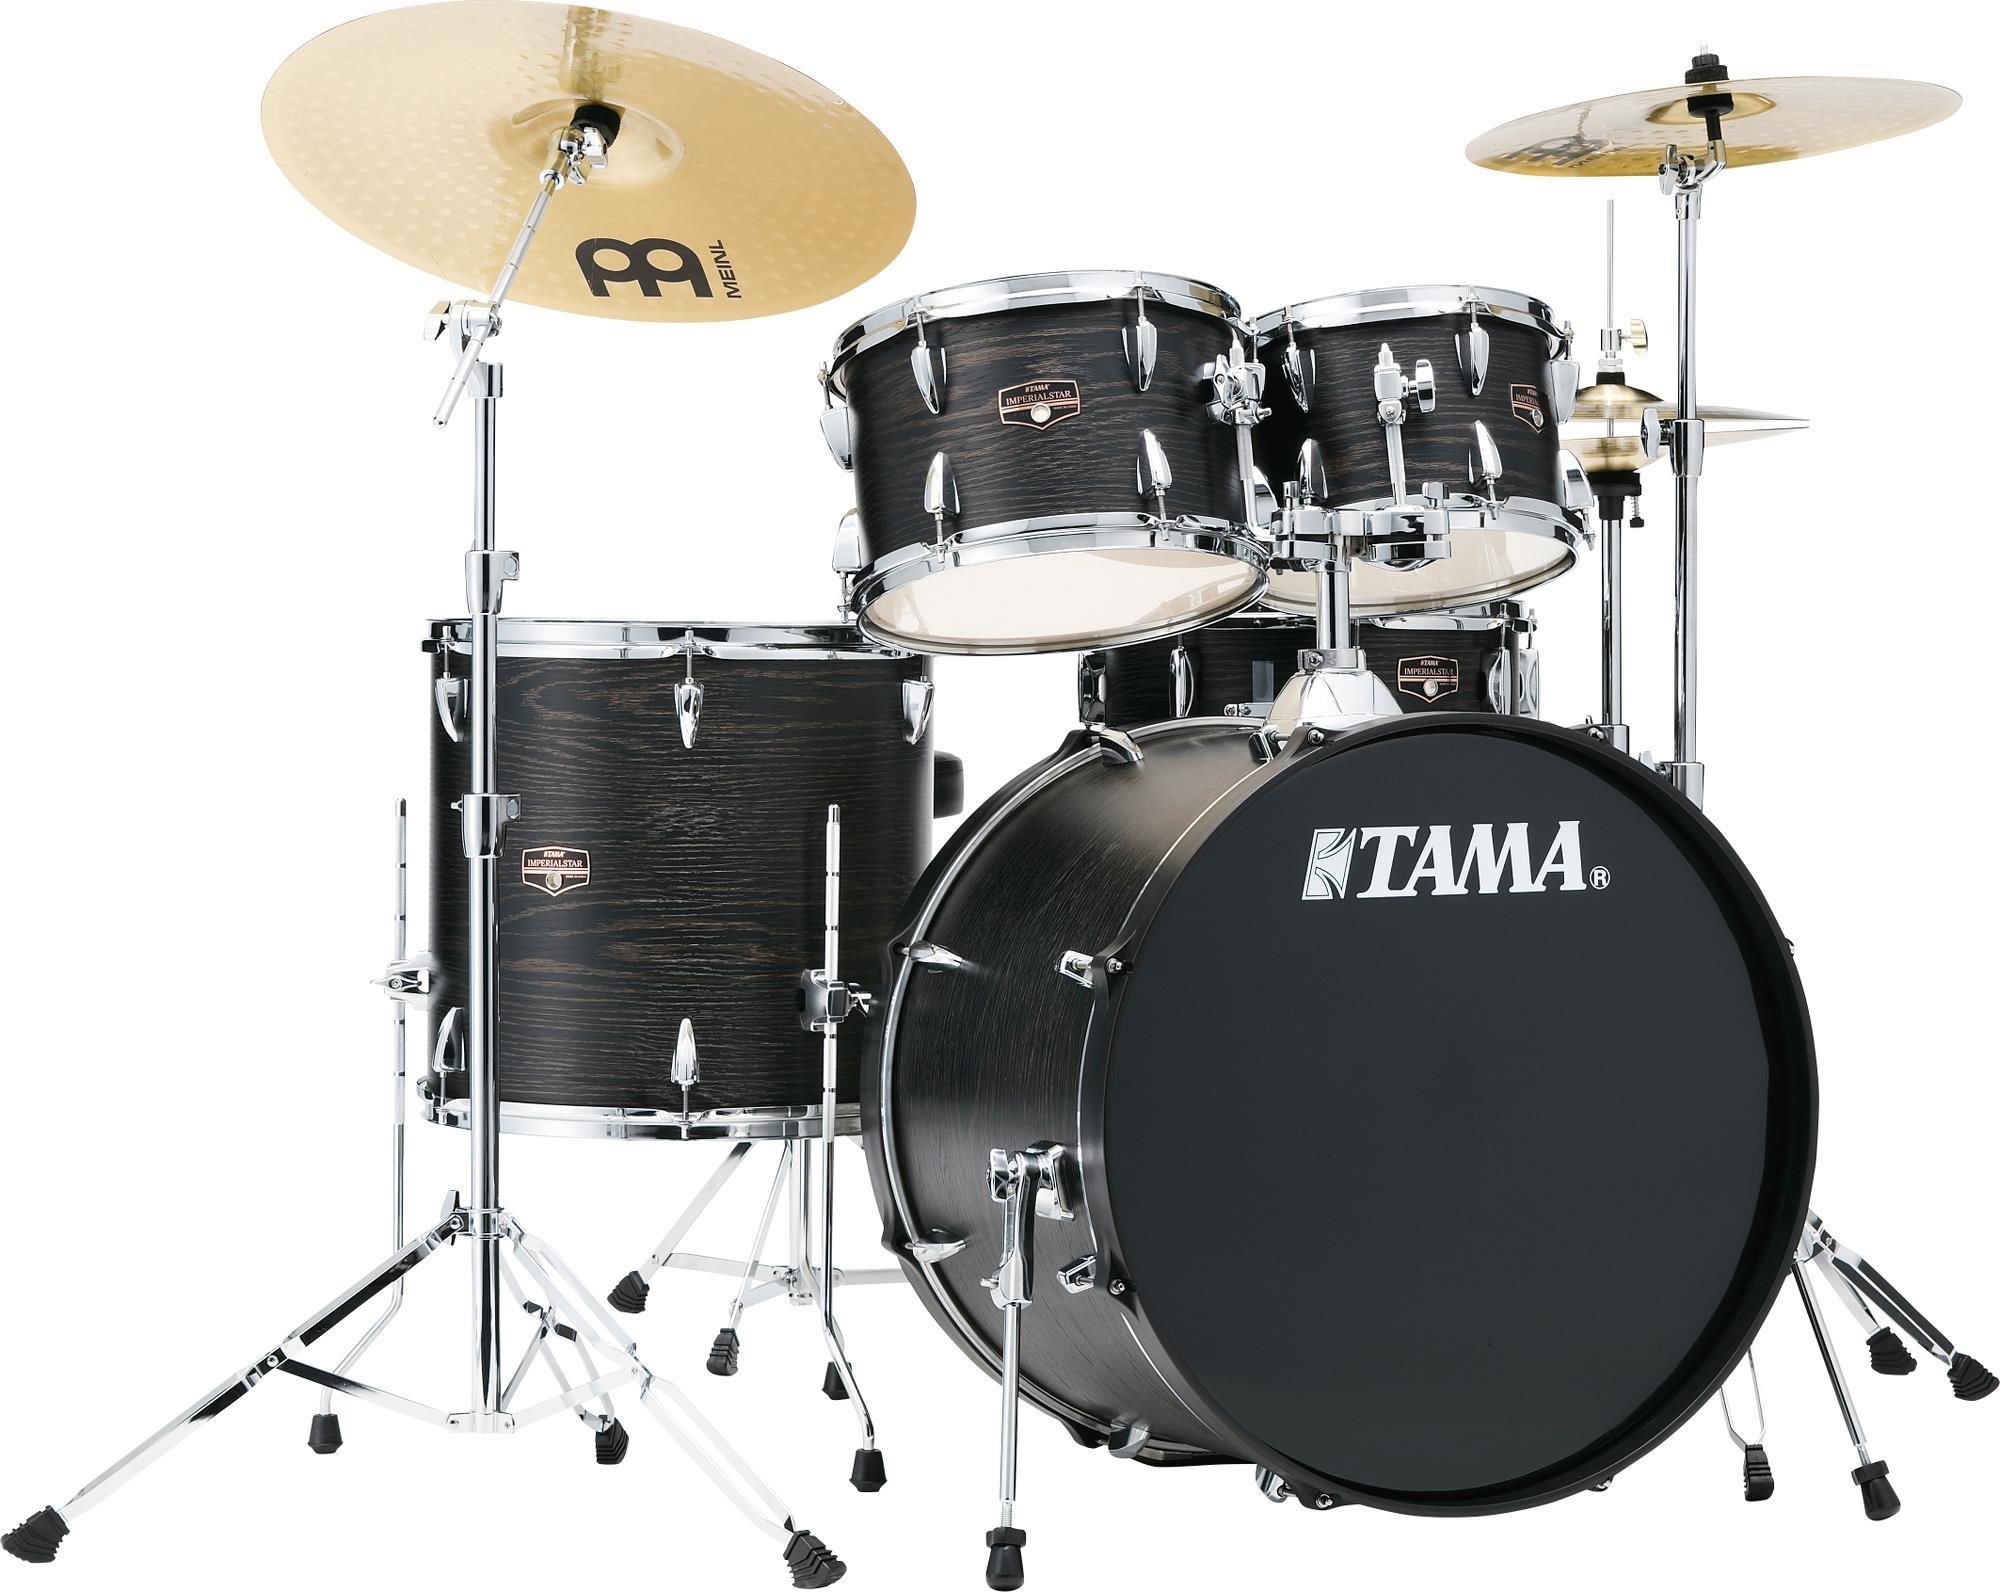 TAMA Imperialstar 5pc 22 BD Complete Kit Meinl HCS Cymbals - Black Oak Wrap finish